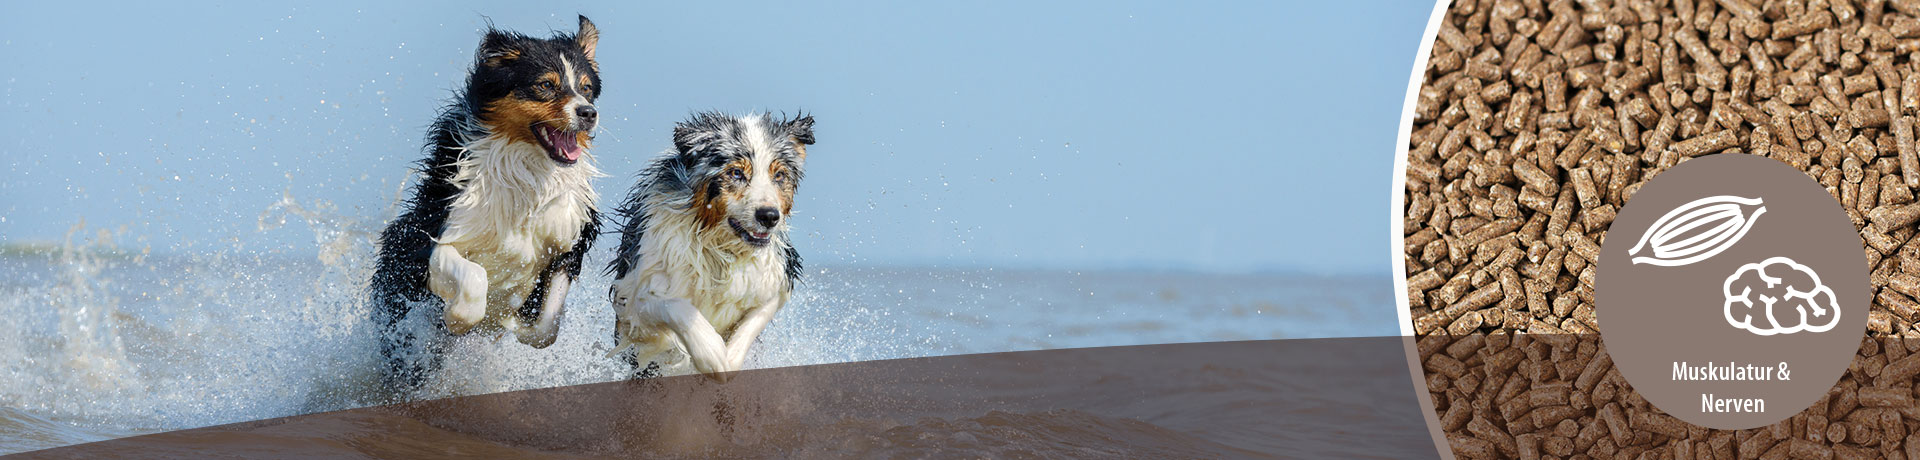 Hund - Unterkategorie - Muskulatur-Nerven